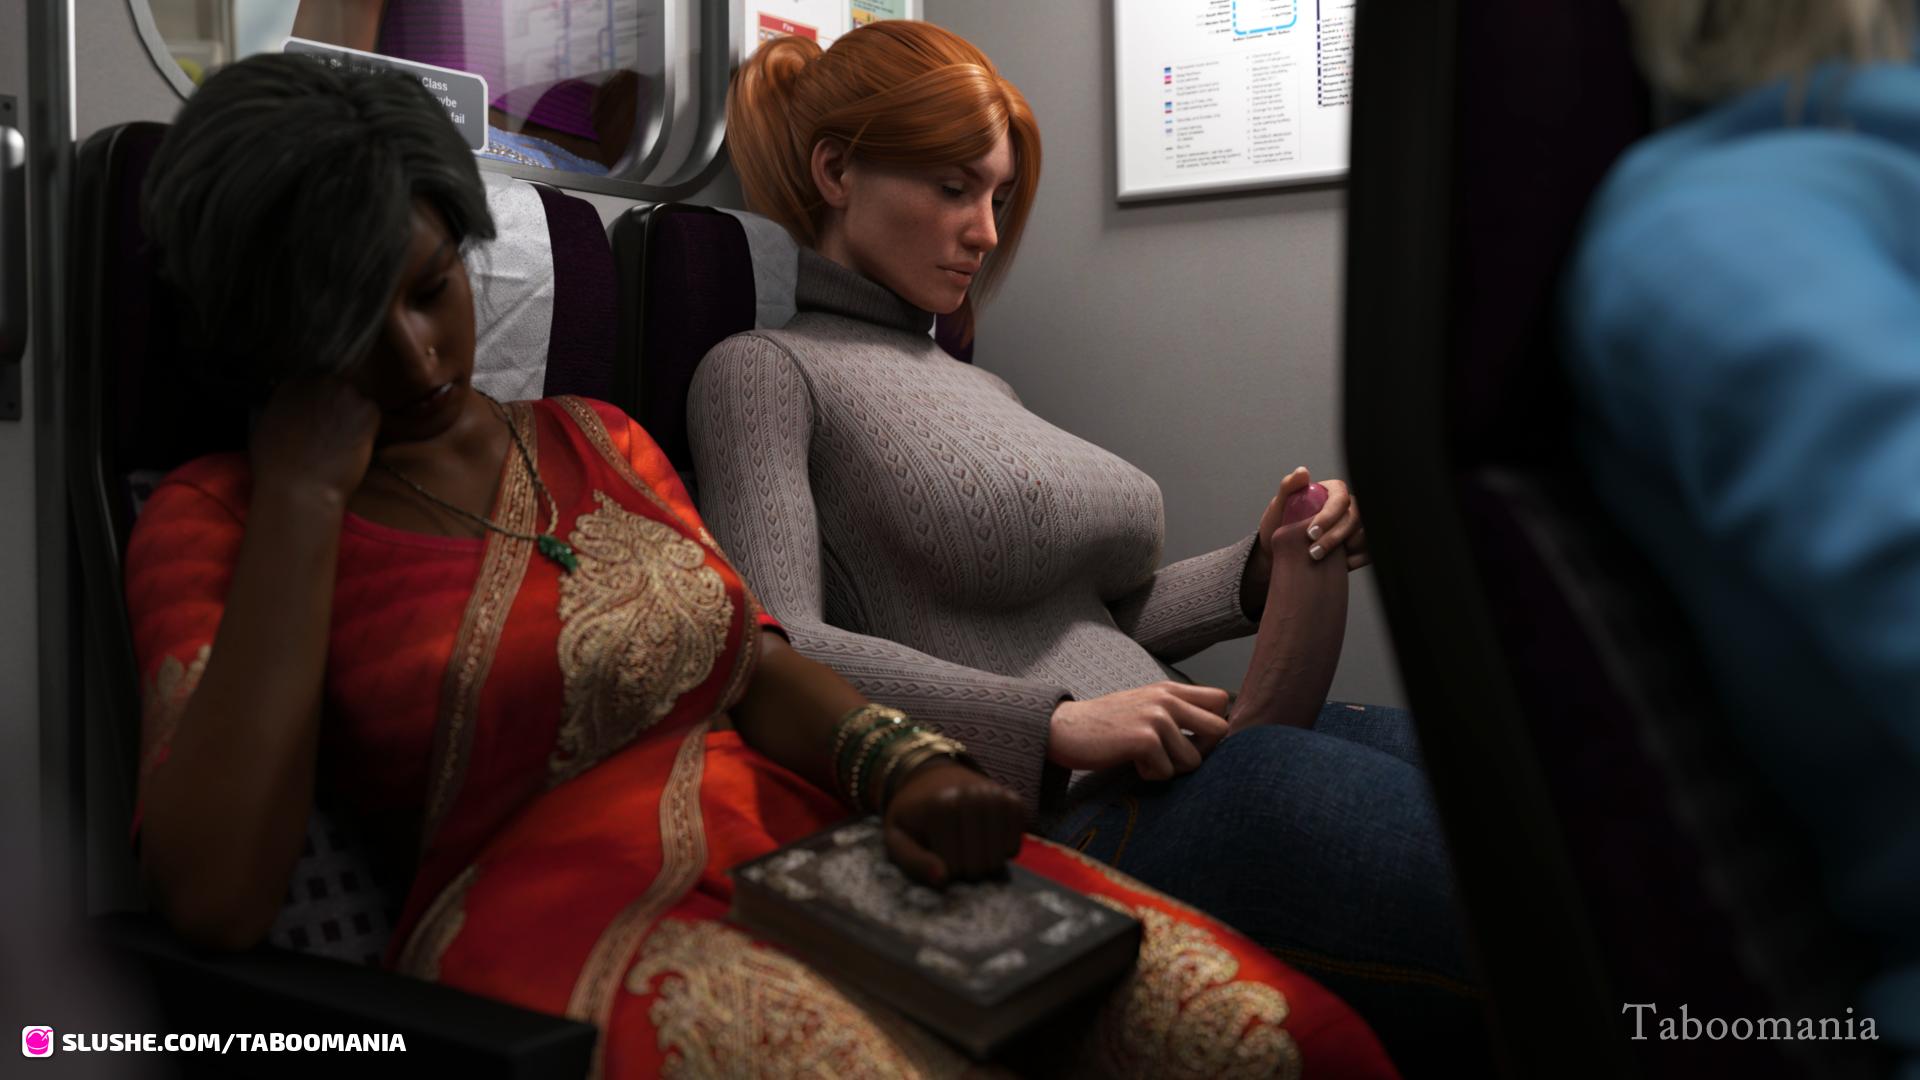 Matilde: Train